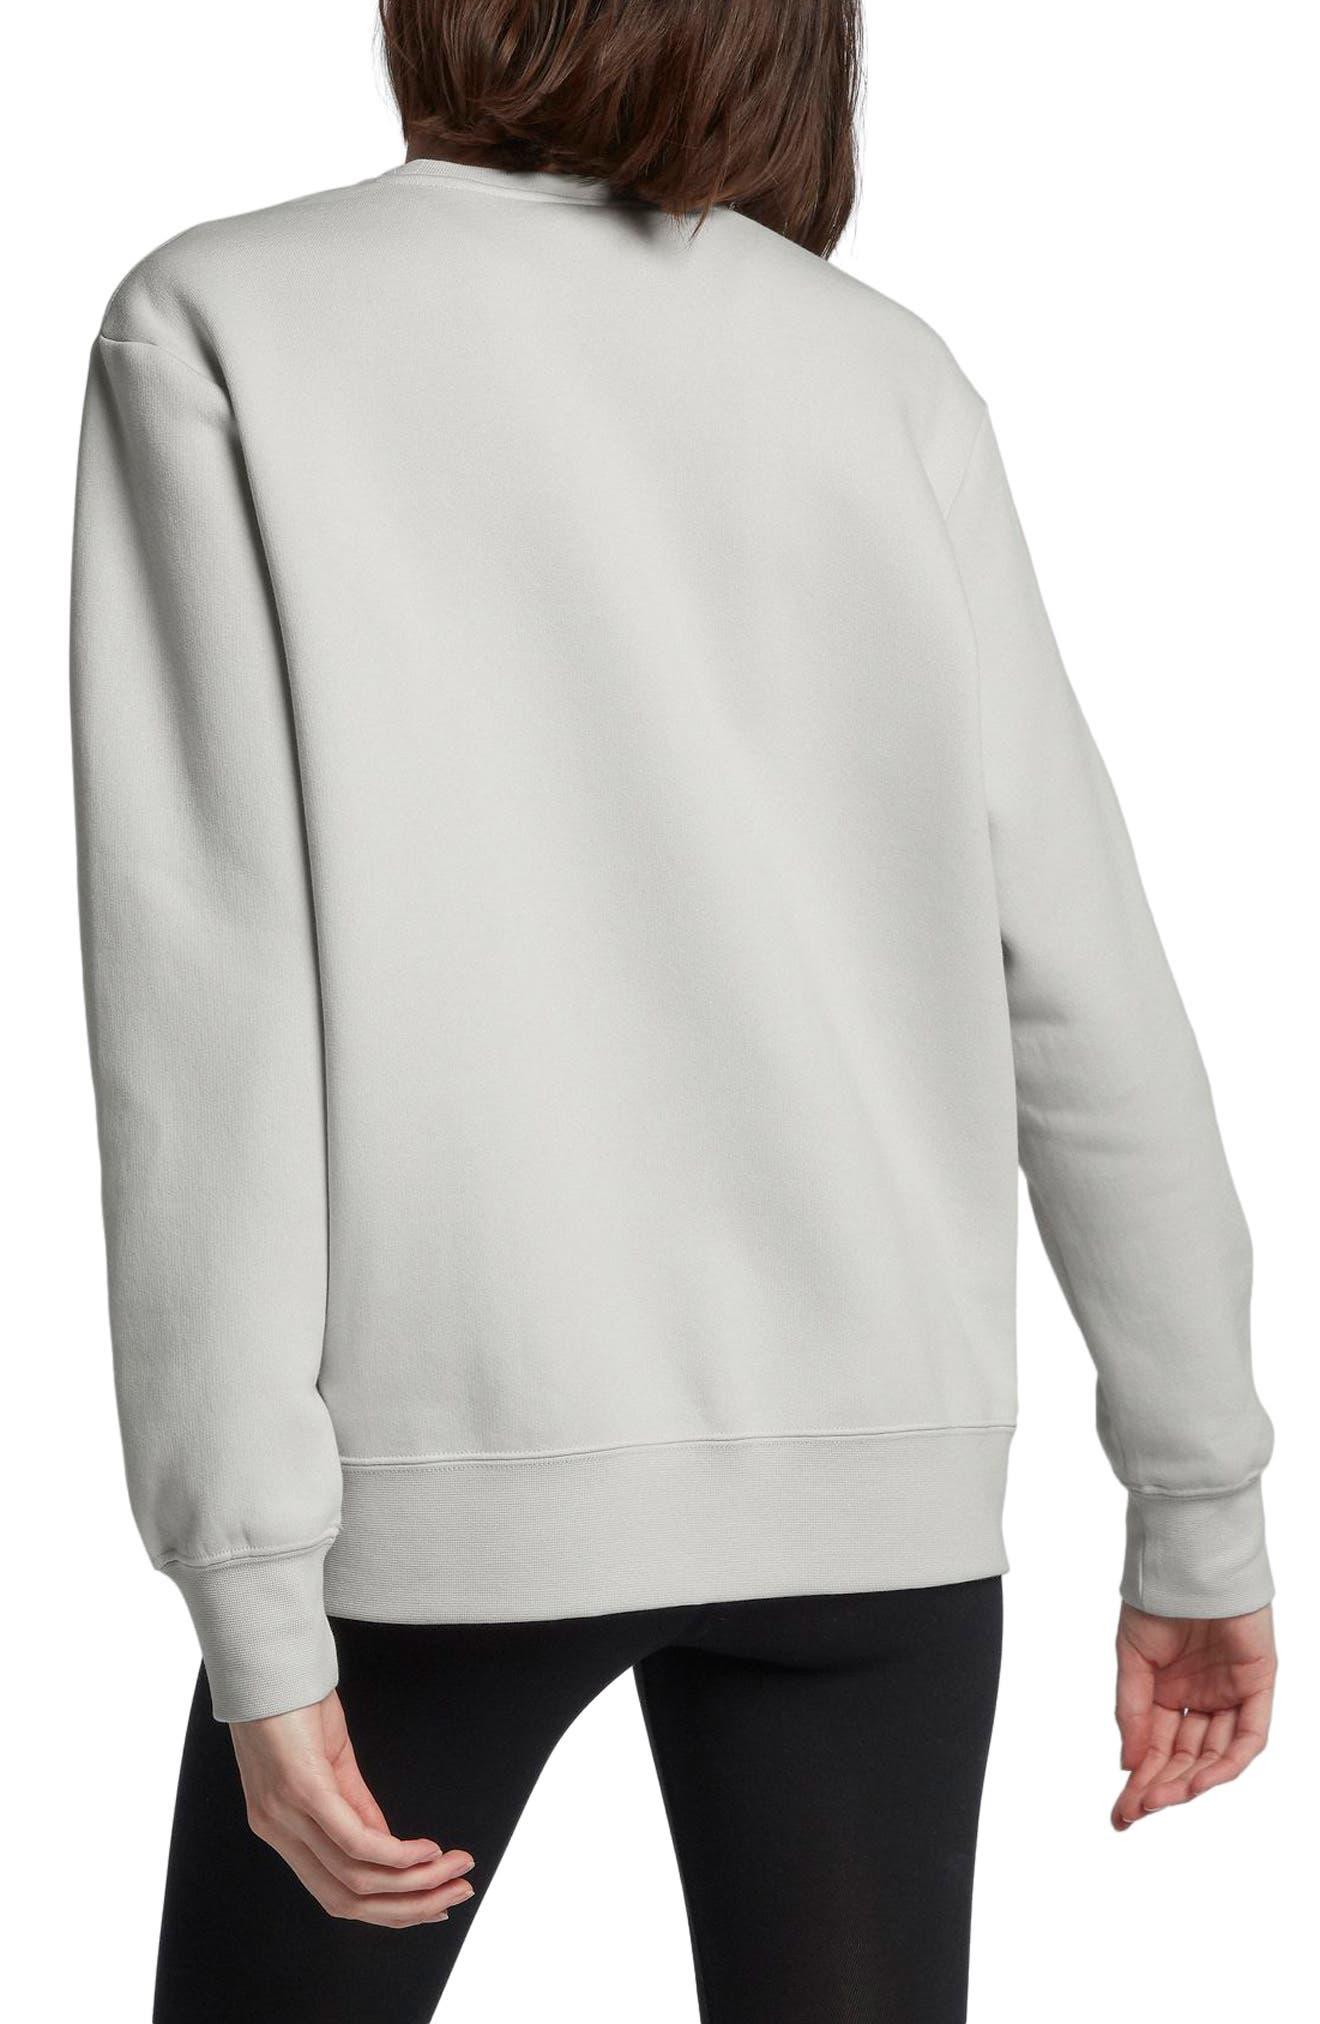 Sportswear Air Max 1 Women's Graphic Crewneck Sweatshirt,                             Alternate thumbnail 2, color,                             Vast Grey